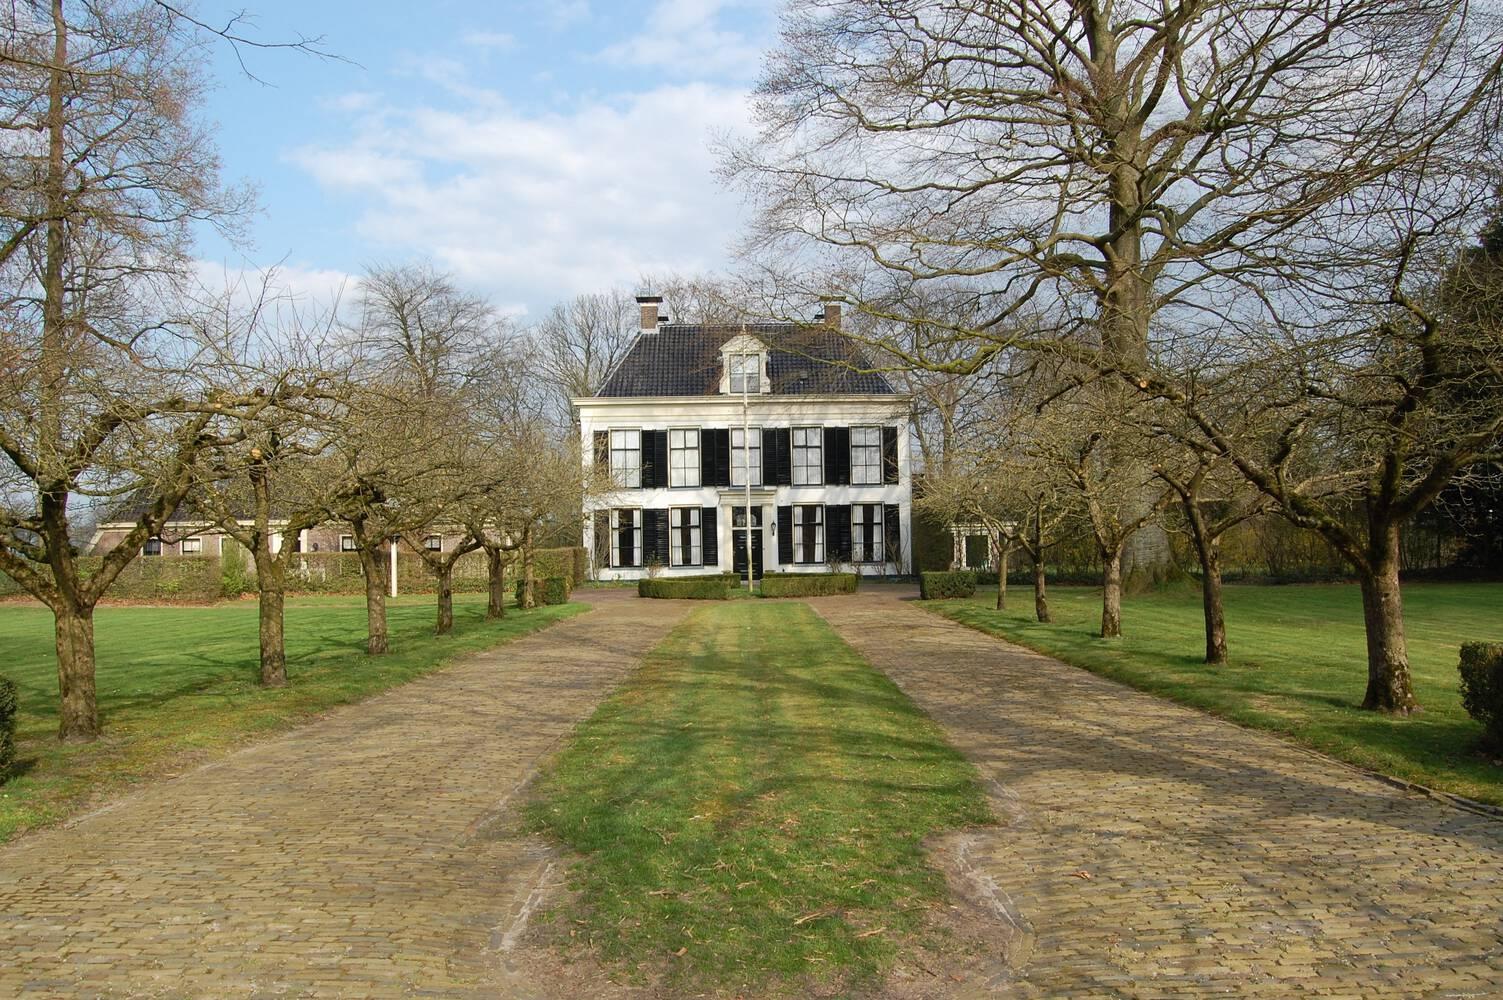 Havezate Westrup (Entingheweg 20)